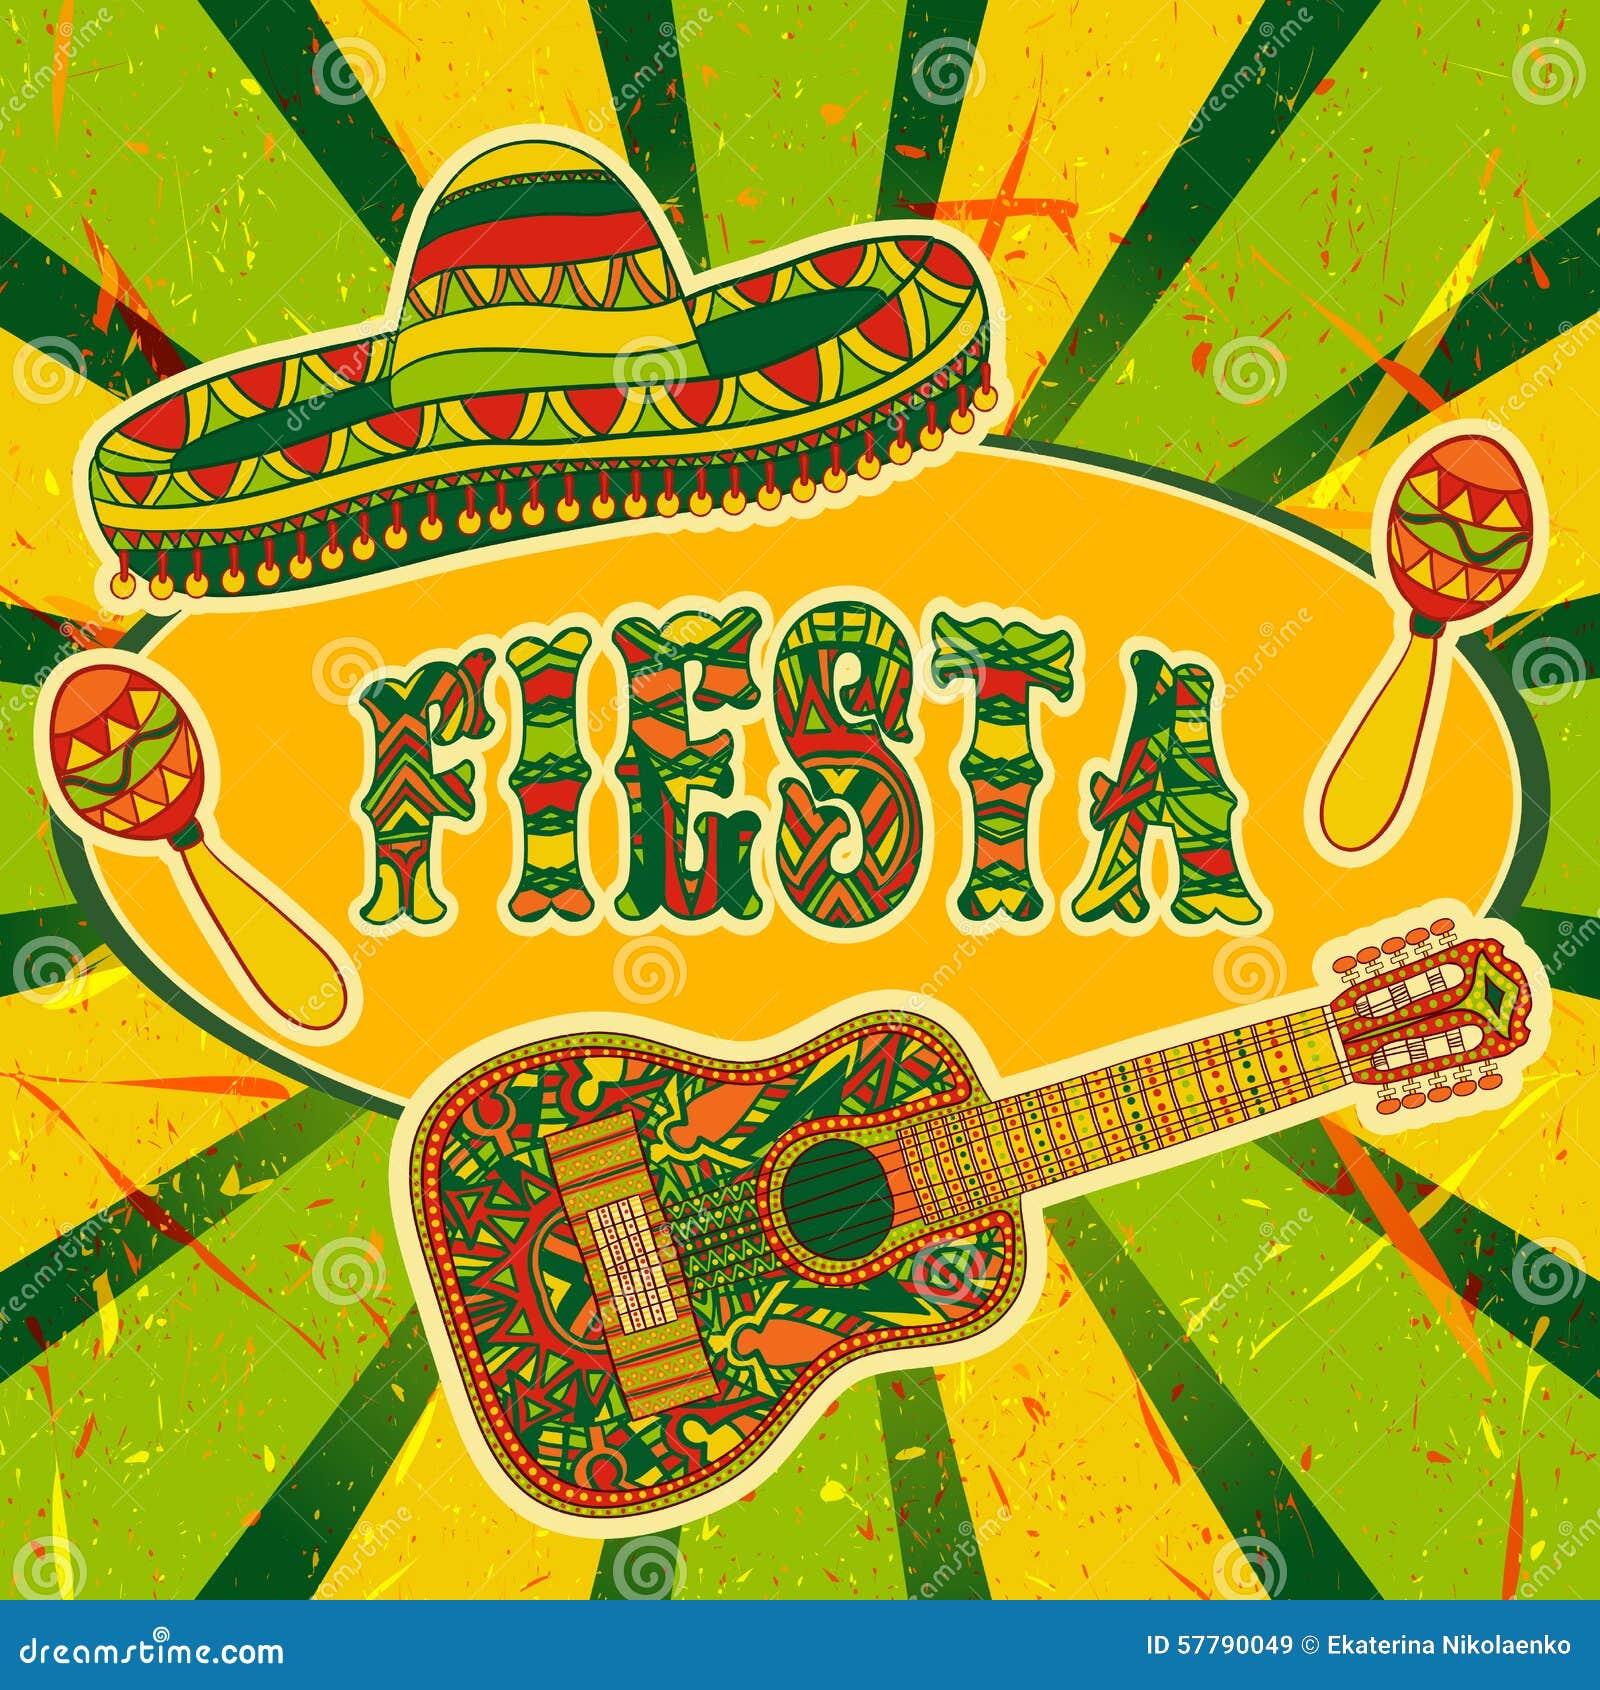 Mexican Fiesta Invitation is great invitation ideas